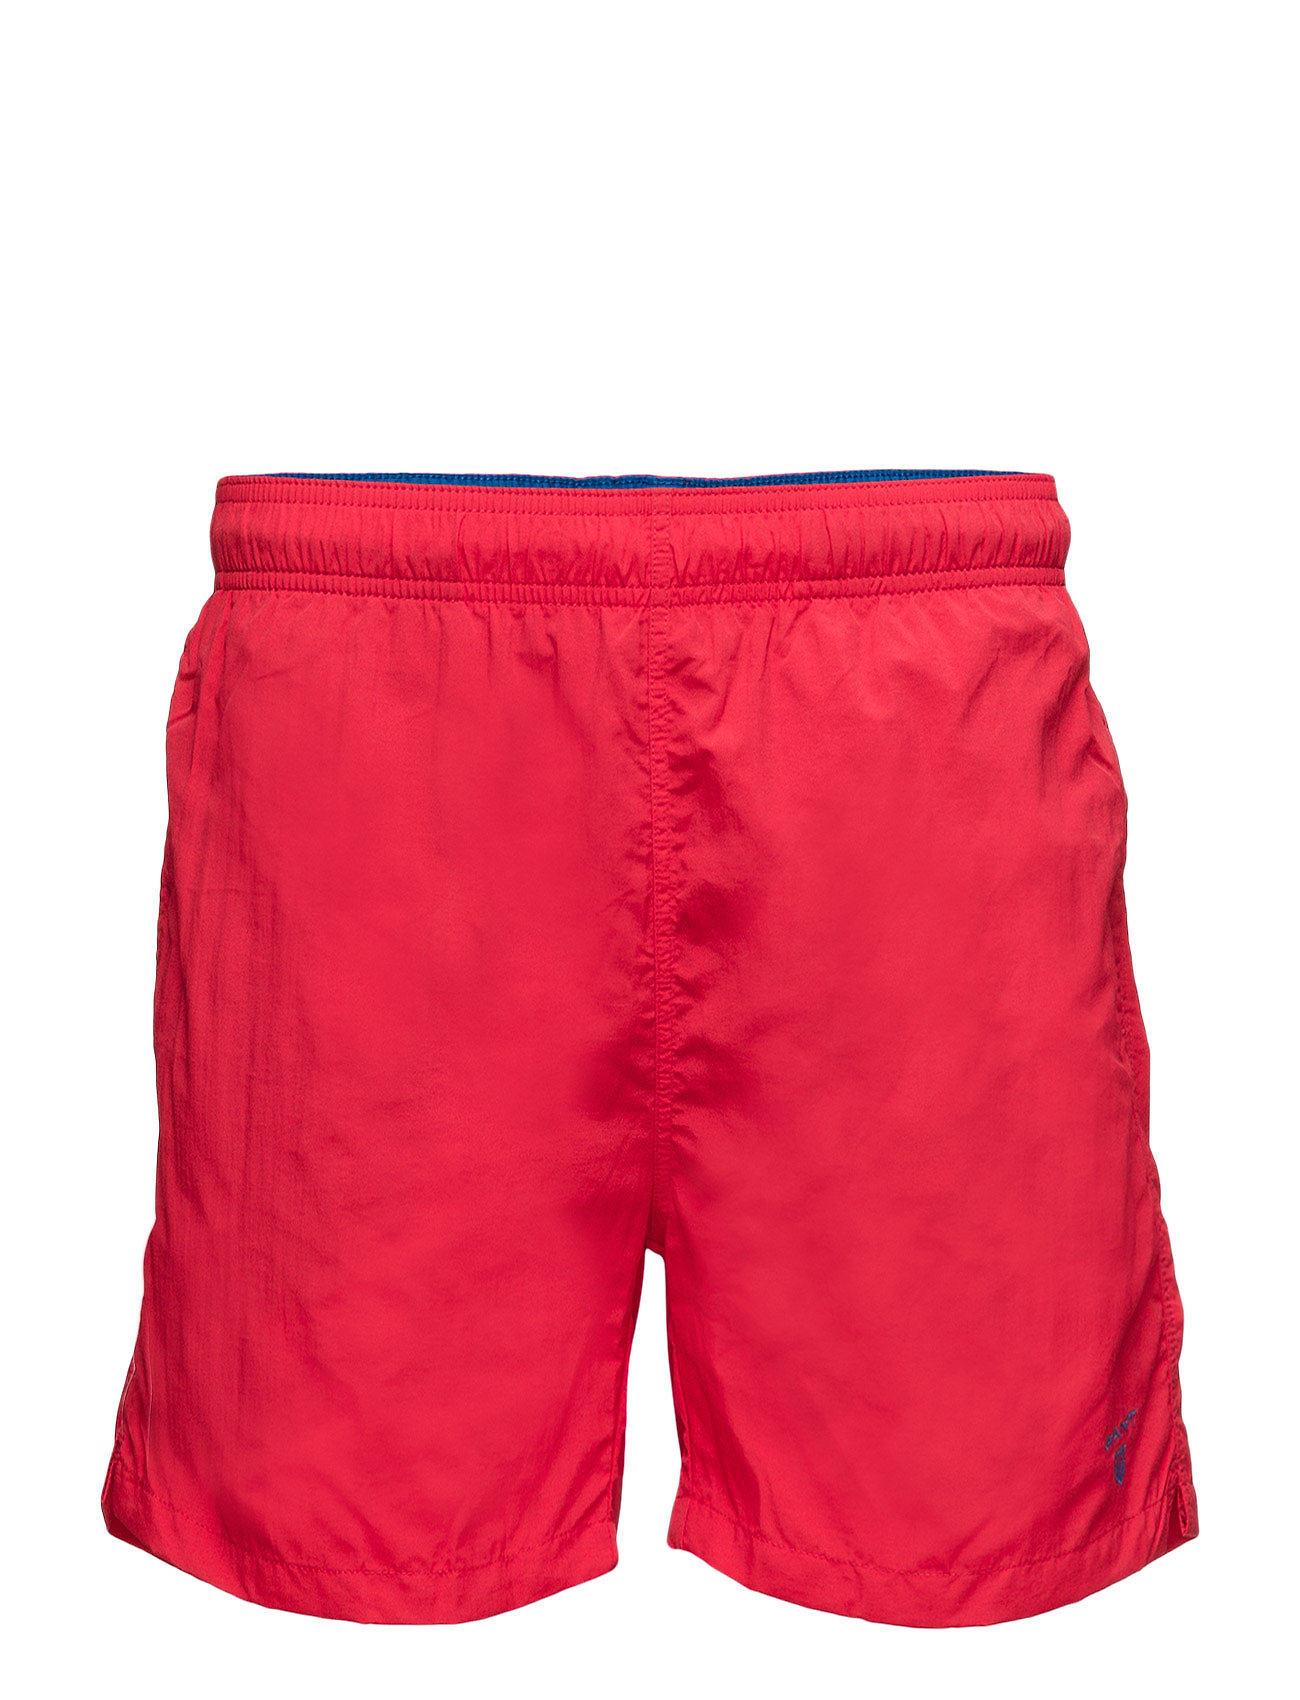 beste website 71027 1b10b Basic Swim Shorts Classic Fit Badeshorts Rød GANT